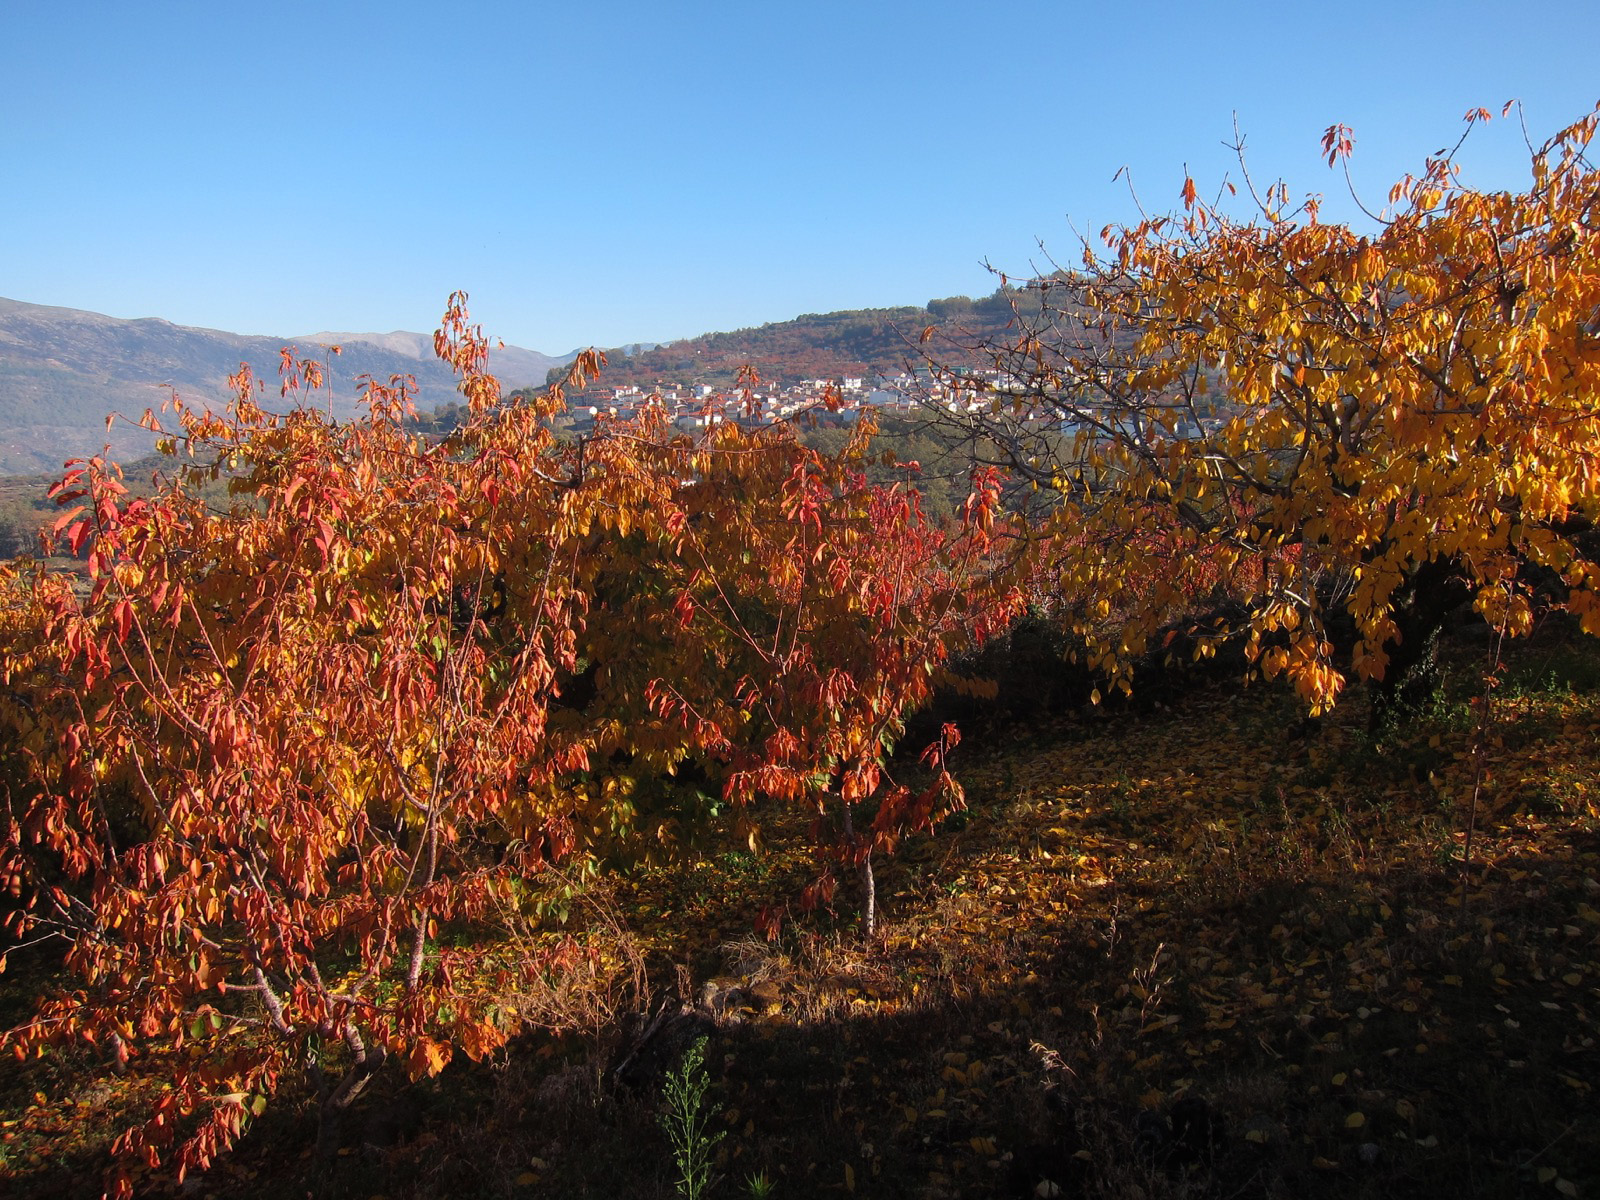 Valle del Jerte, Cáceres